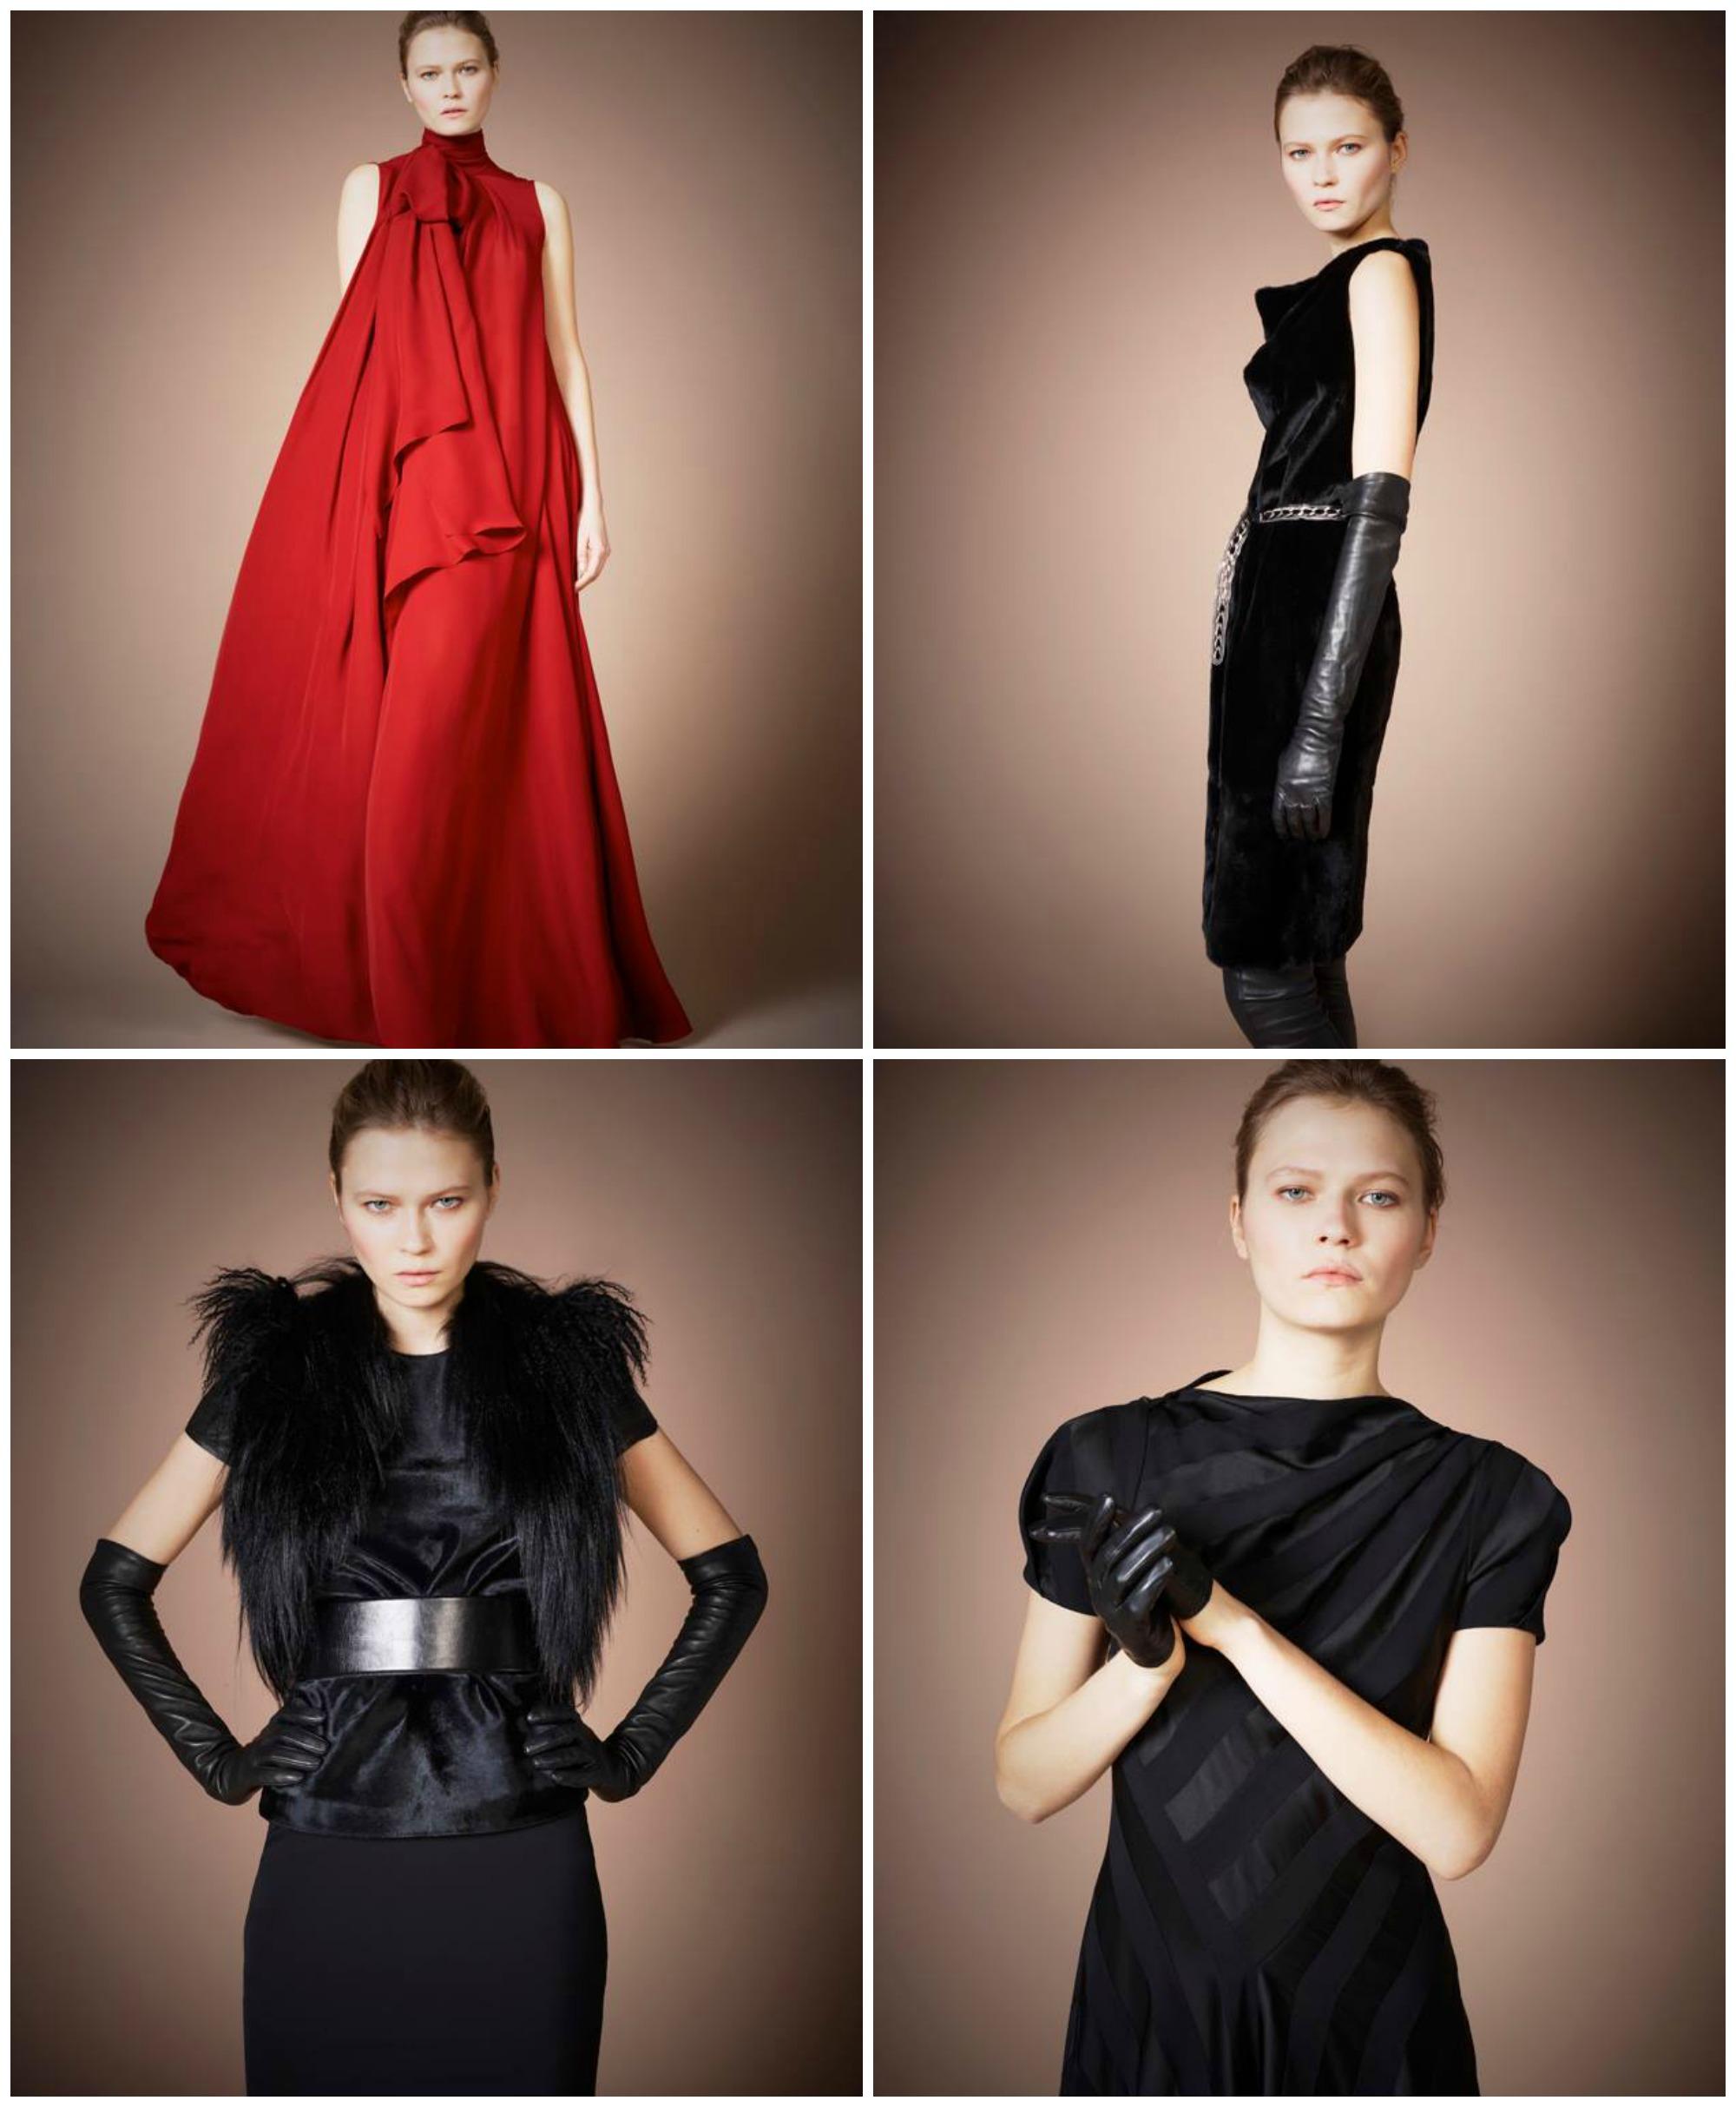 quality design ccb10 d1071 Plein Sud Pre-Collection AW 14-15 – The Fashion Talk